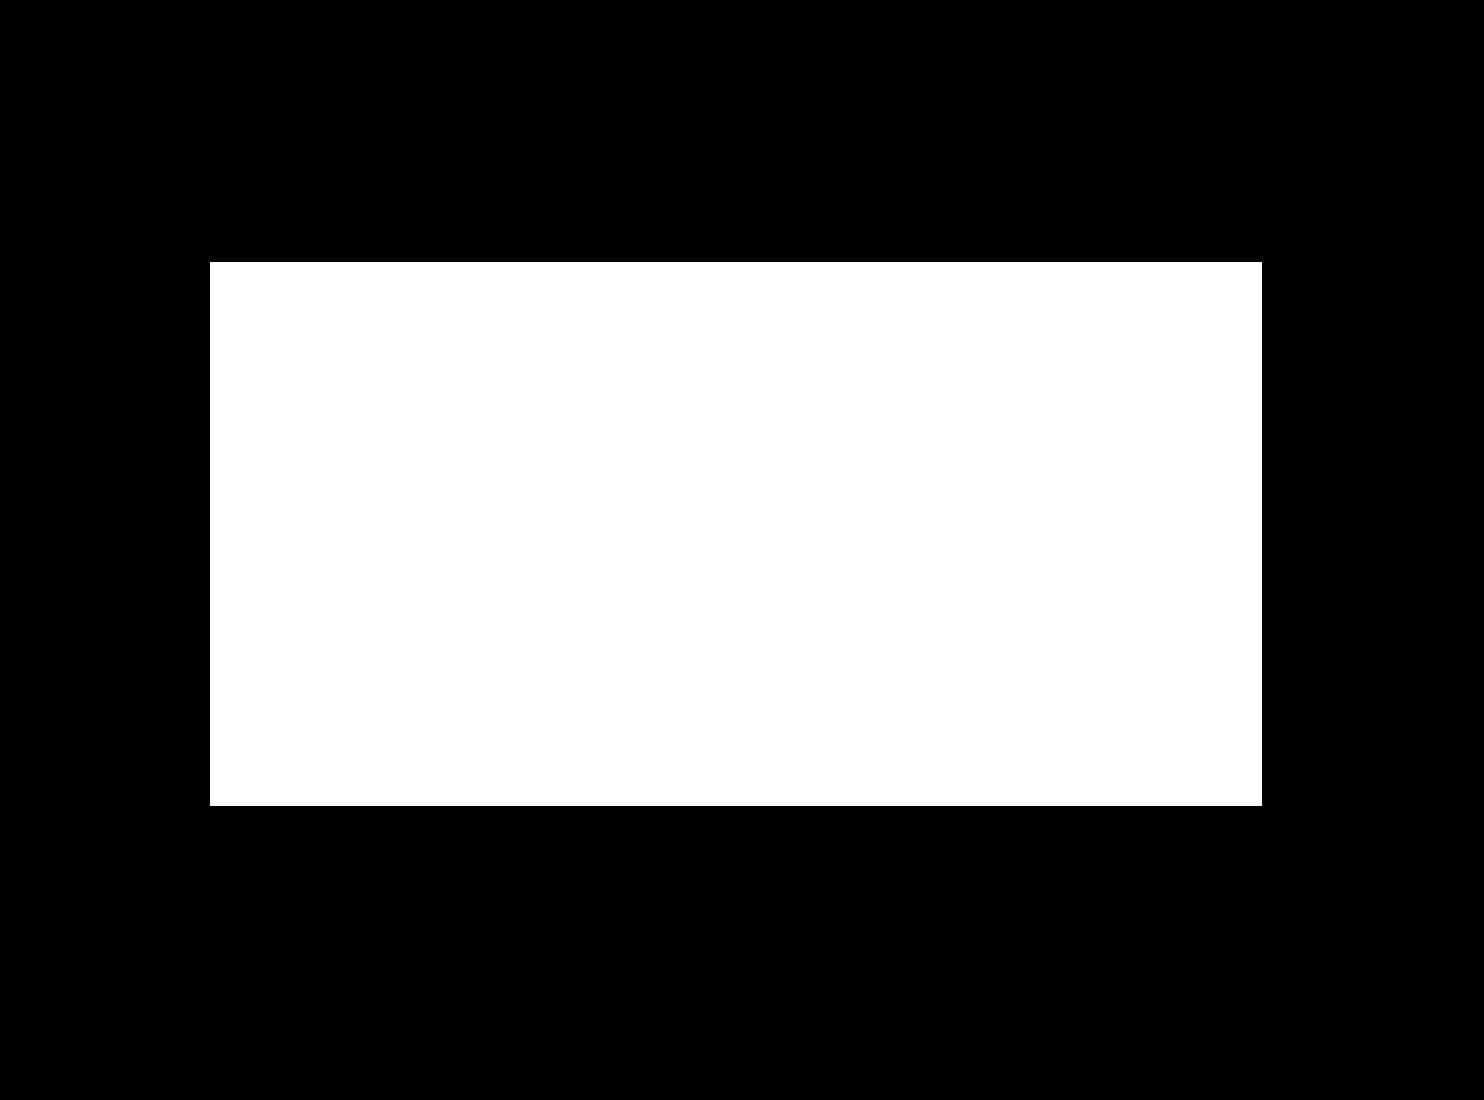 Disney_white.png